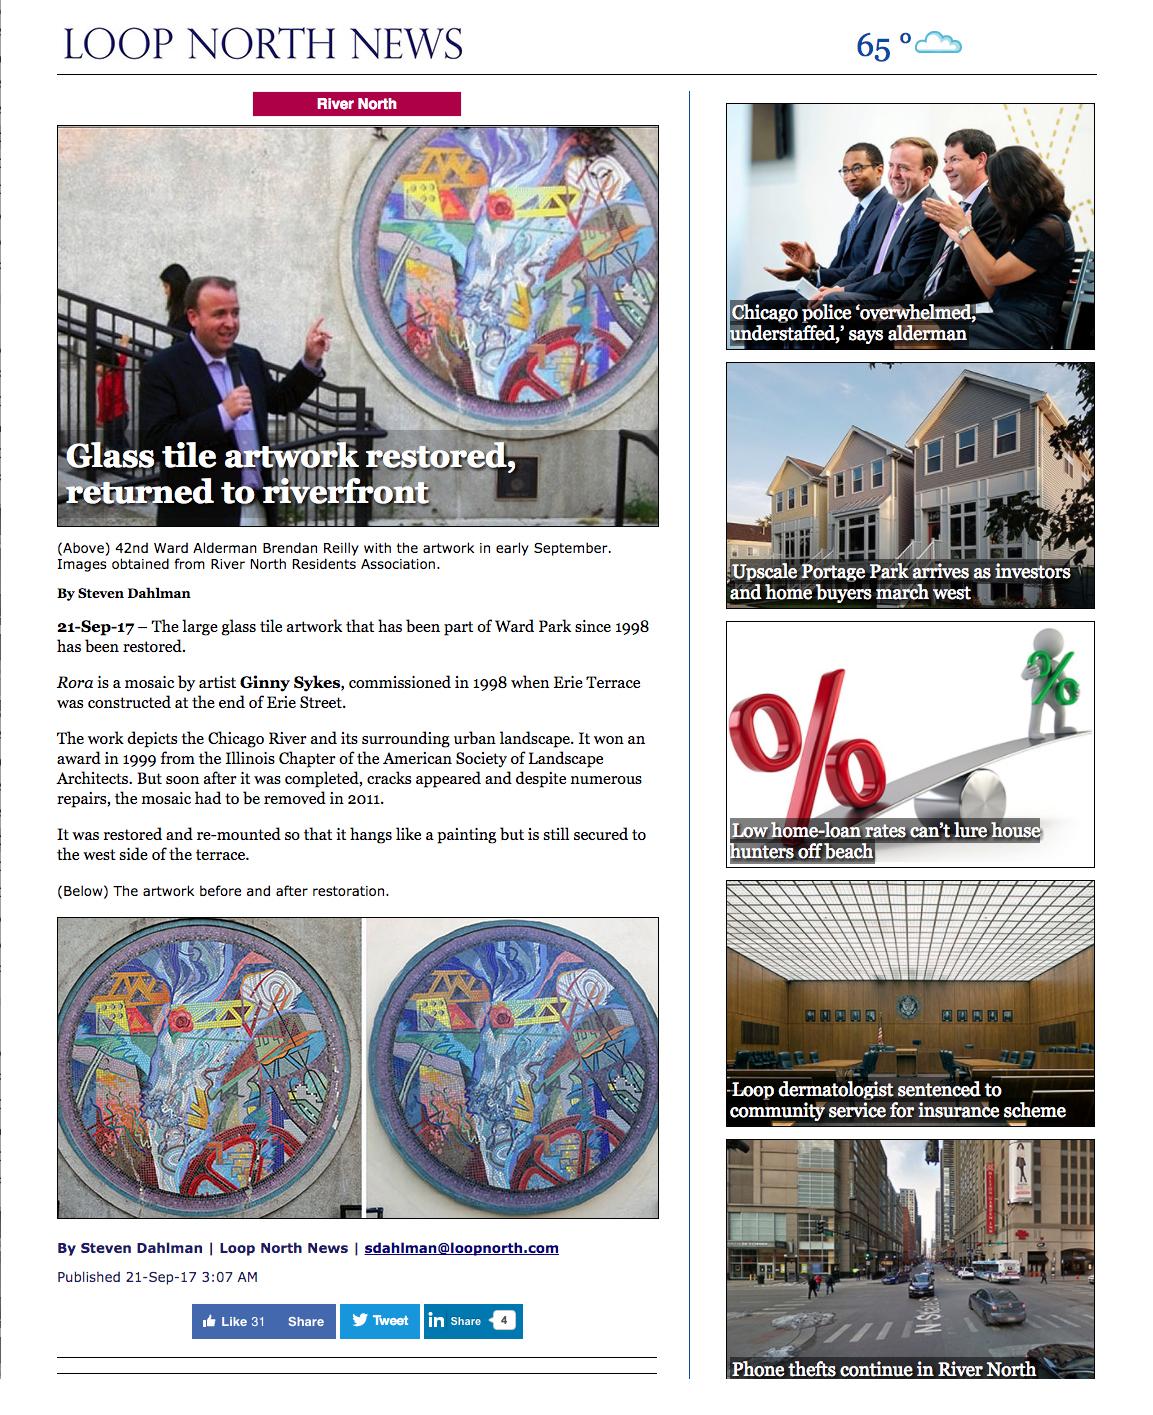 LoopNorthNews_mosaic_press.jpg